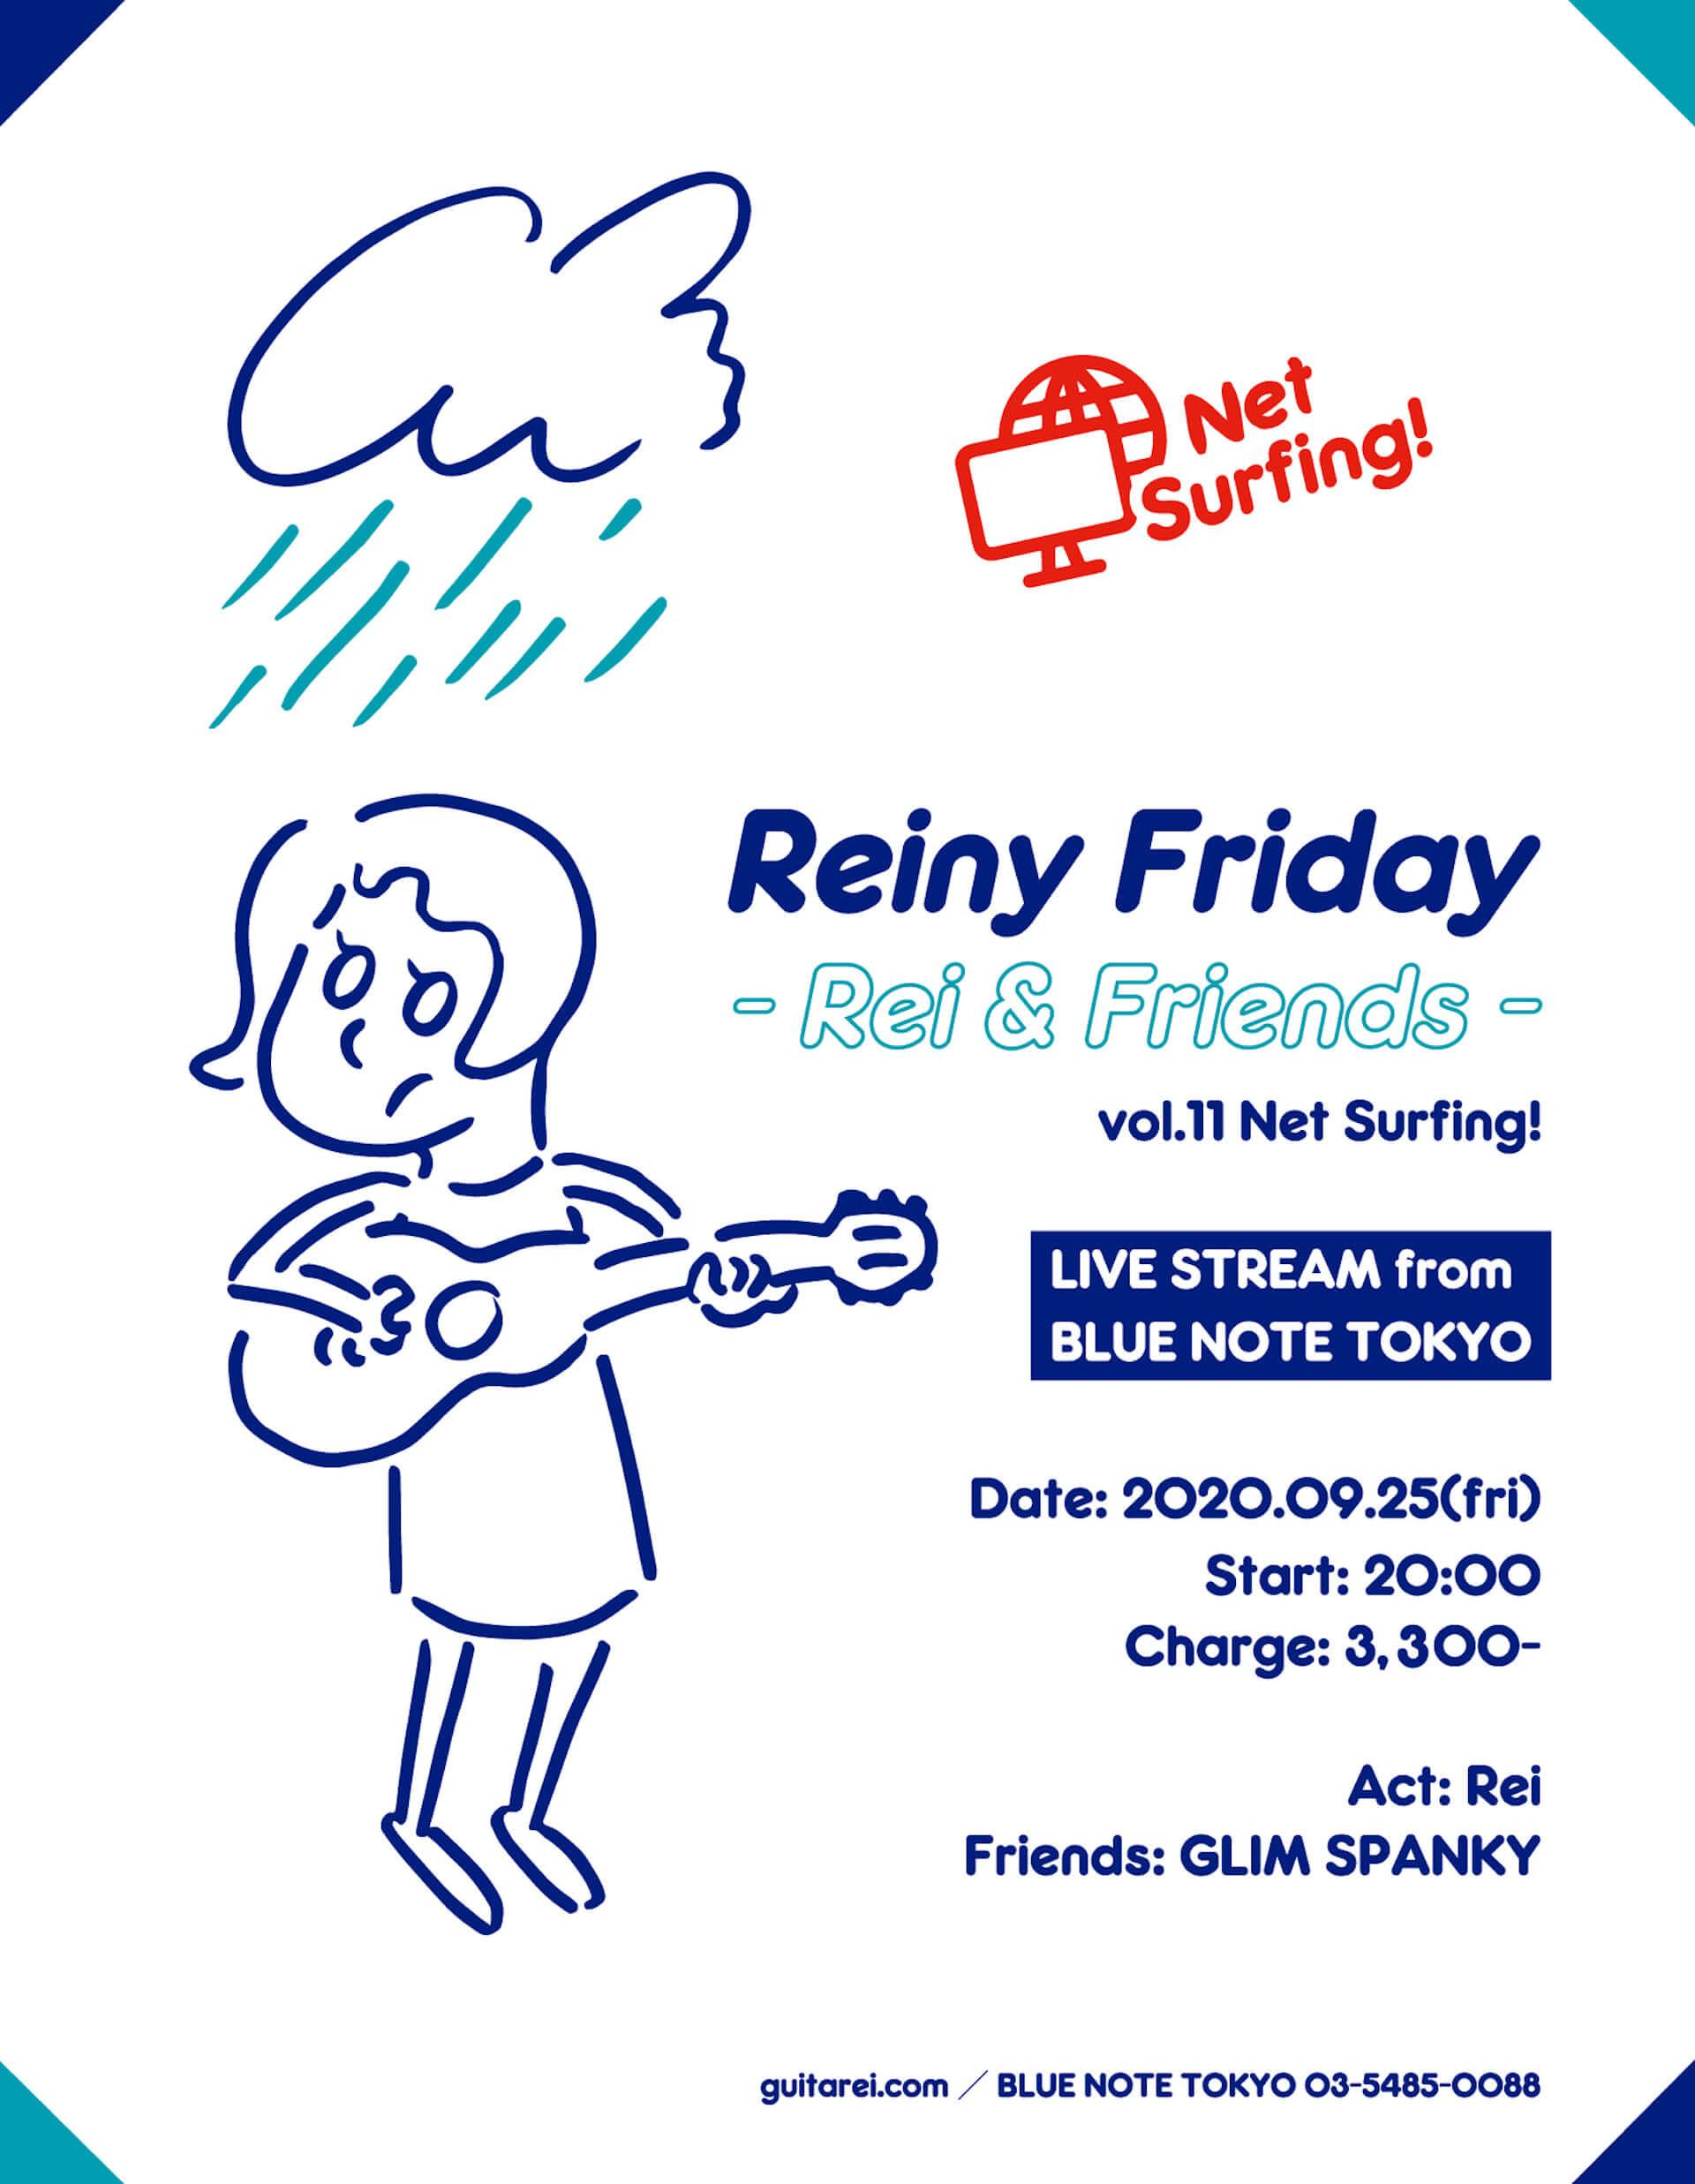 Reiがブルーノート東京より〈Reiny Friday〉を配信決定!GLIM SPANKYとセッションを披露 music200902_rei-bluenote_1-1920x2474